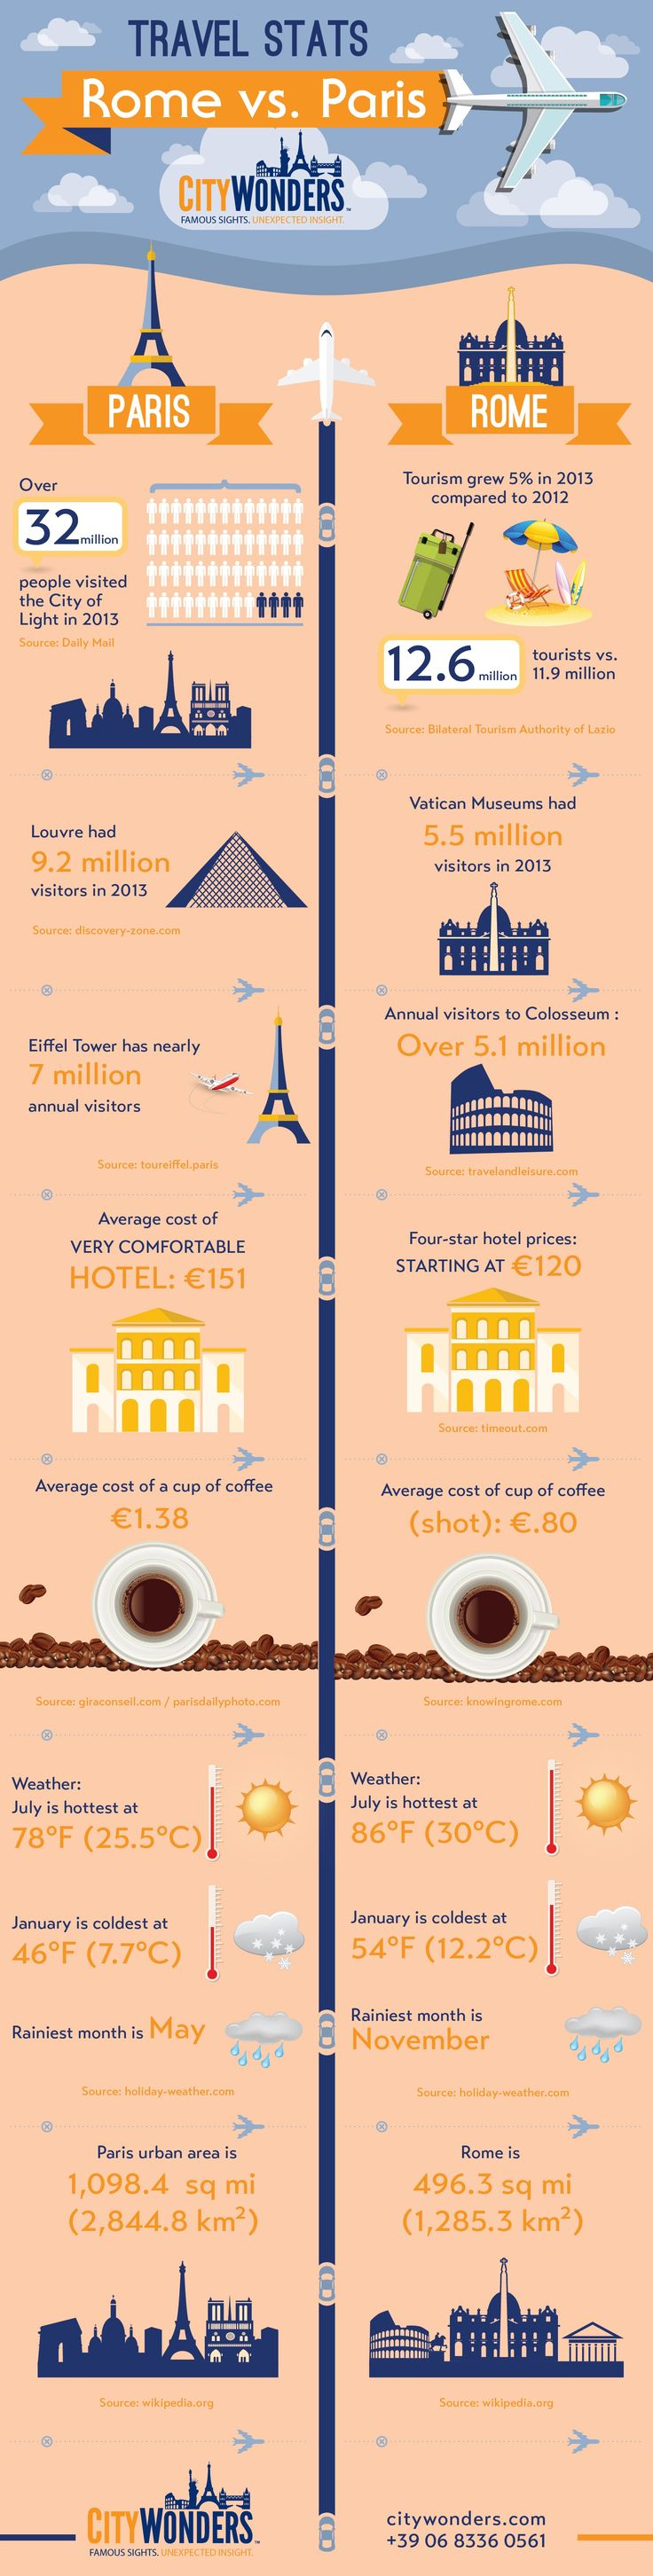 Infographic: Rome vs. Paris Travel Stats  http://www.citywonders.com/blog/rome-vs-paris-travel-stats-infographic/